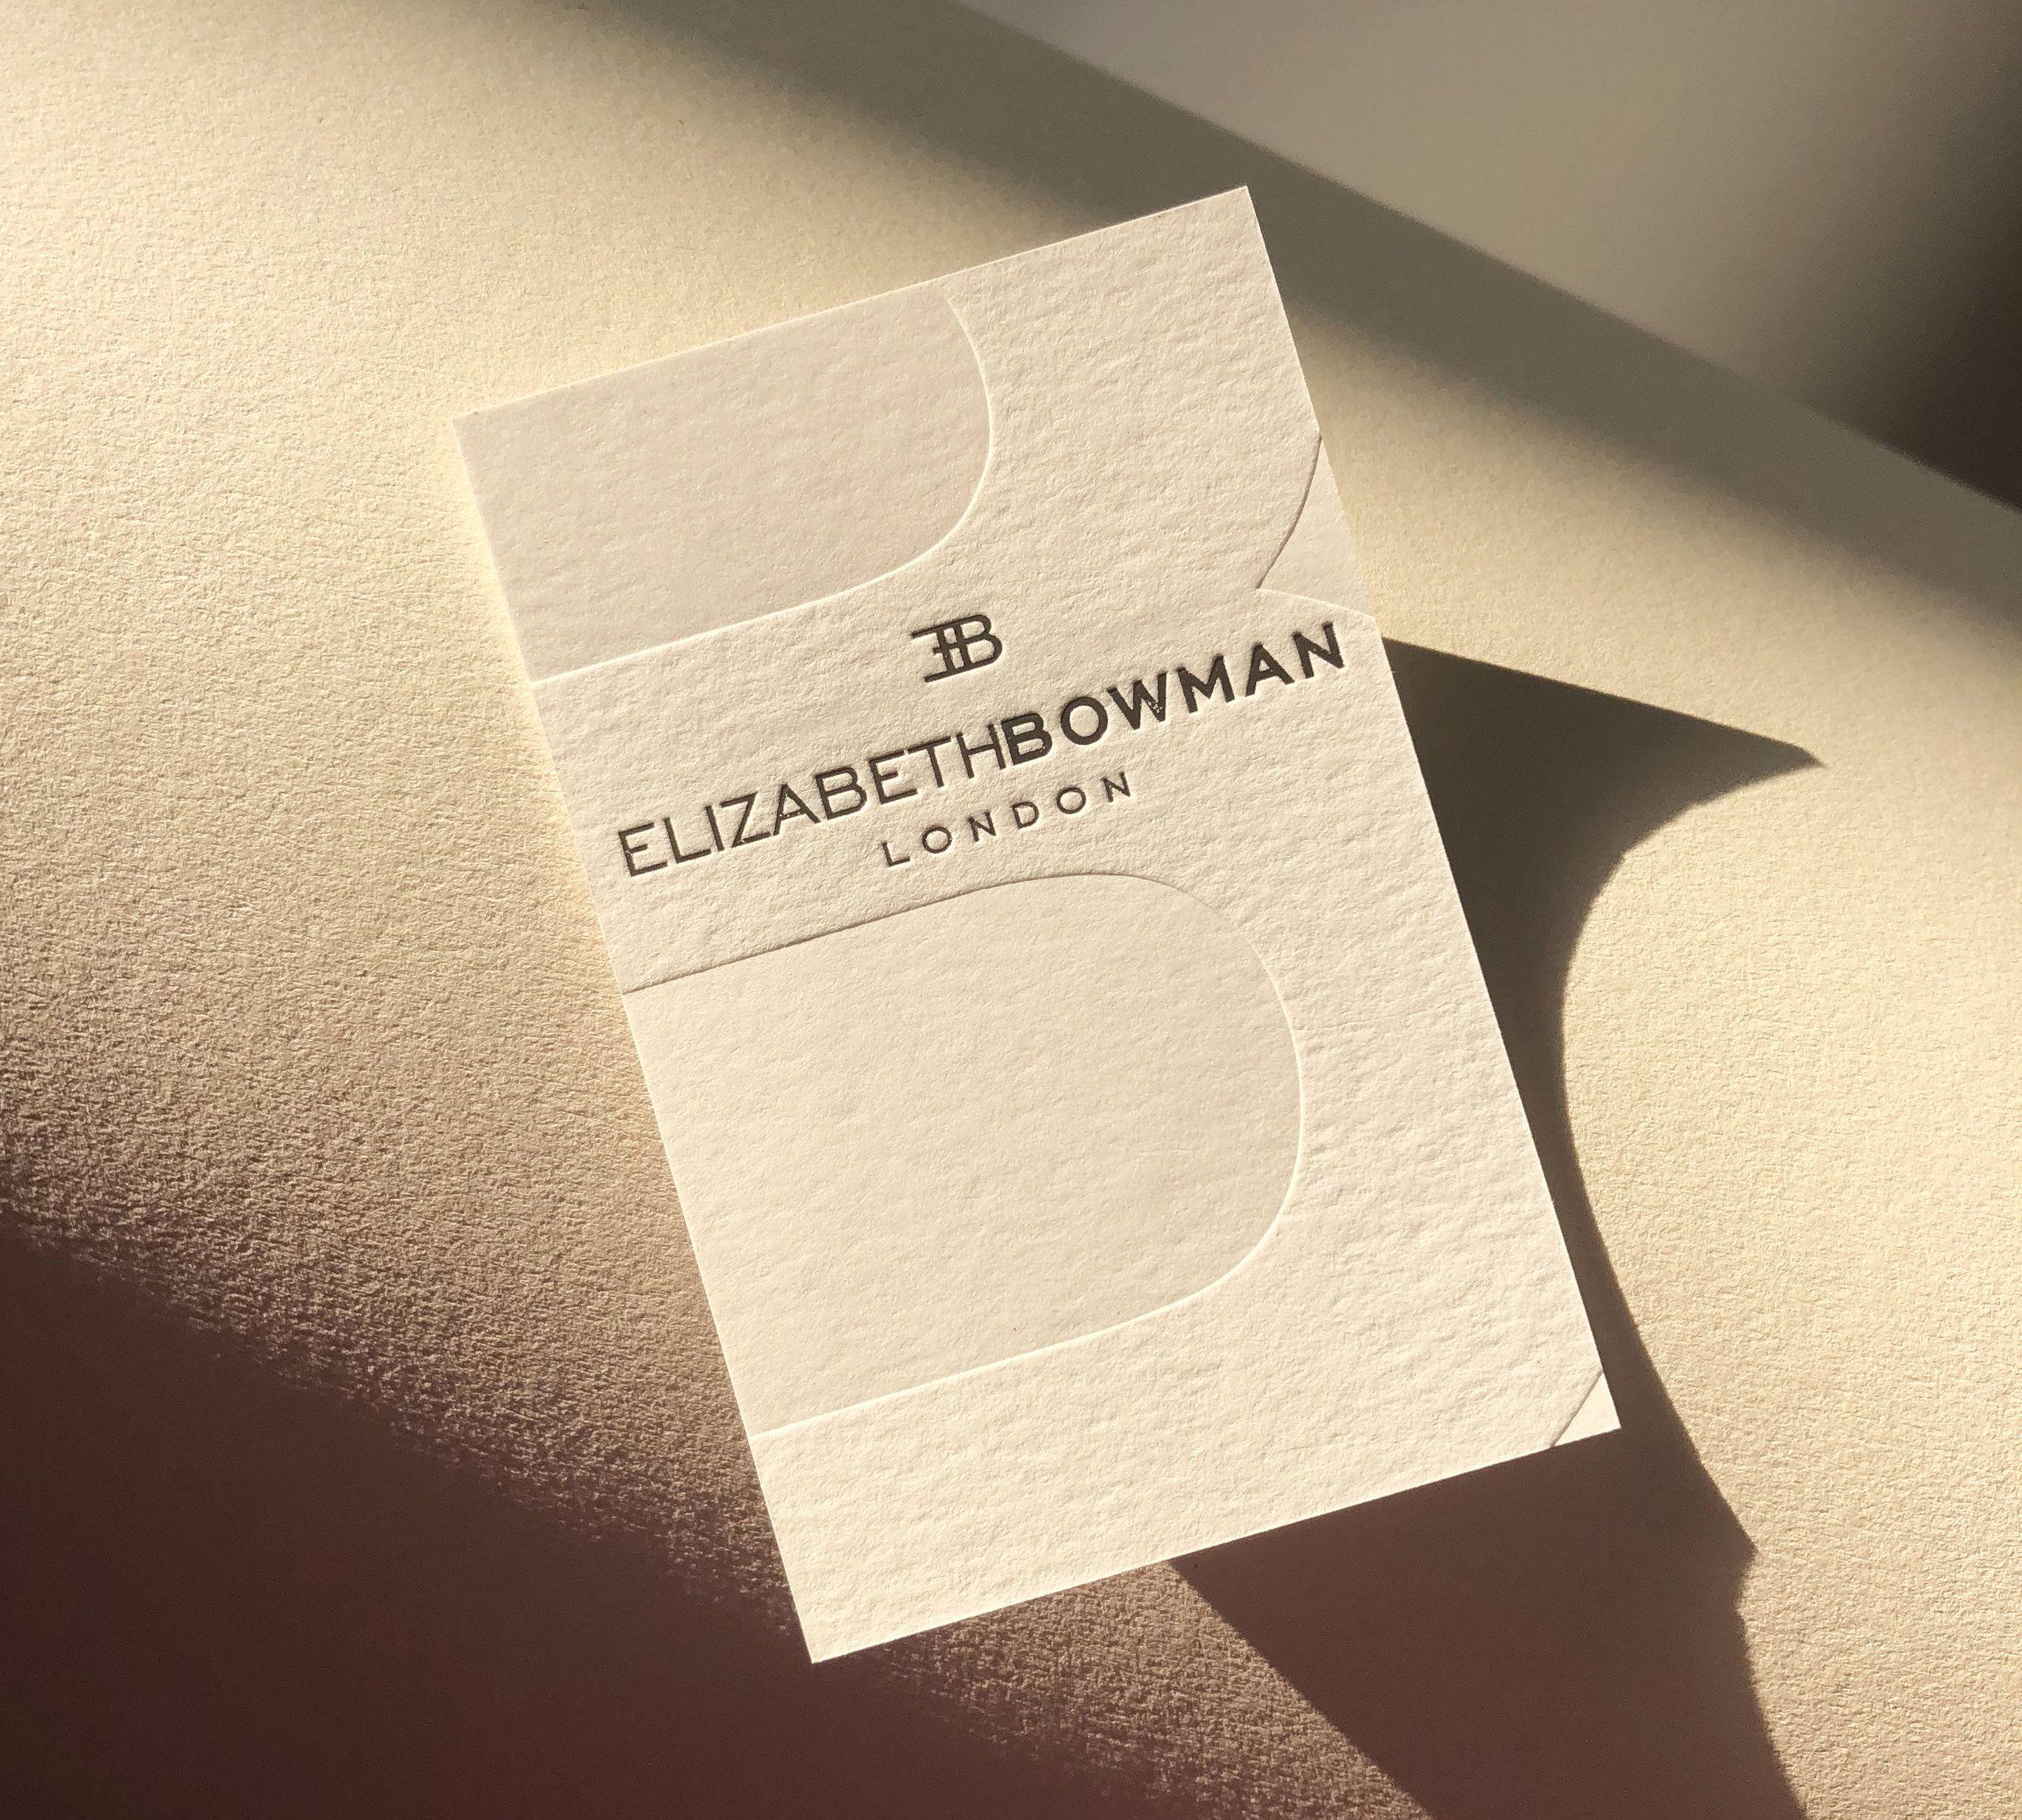 Debossed Business Cards Silver Foil Blind Debosing Printed By Dot Studio Lon Interior Designer Business Card Embossed Business Cards Fashion Business Cards